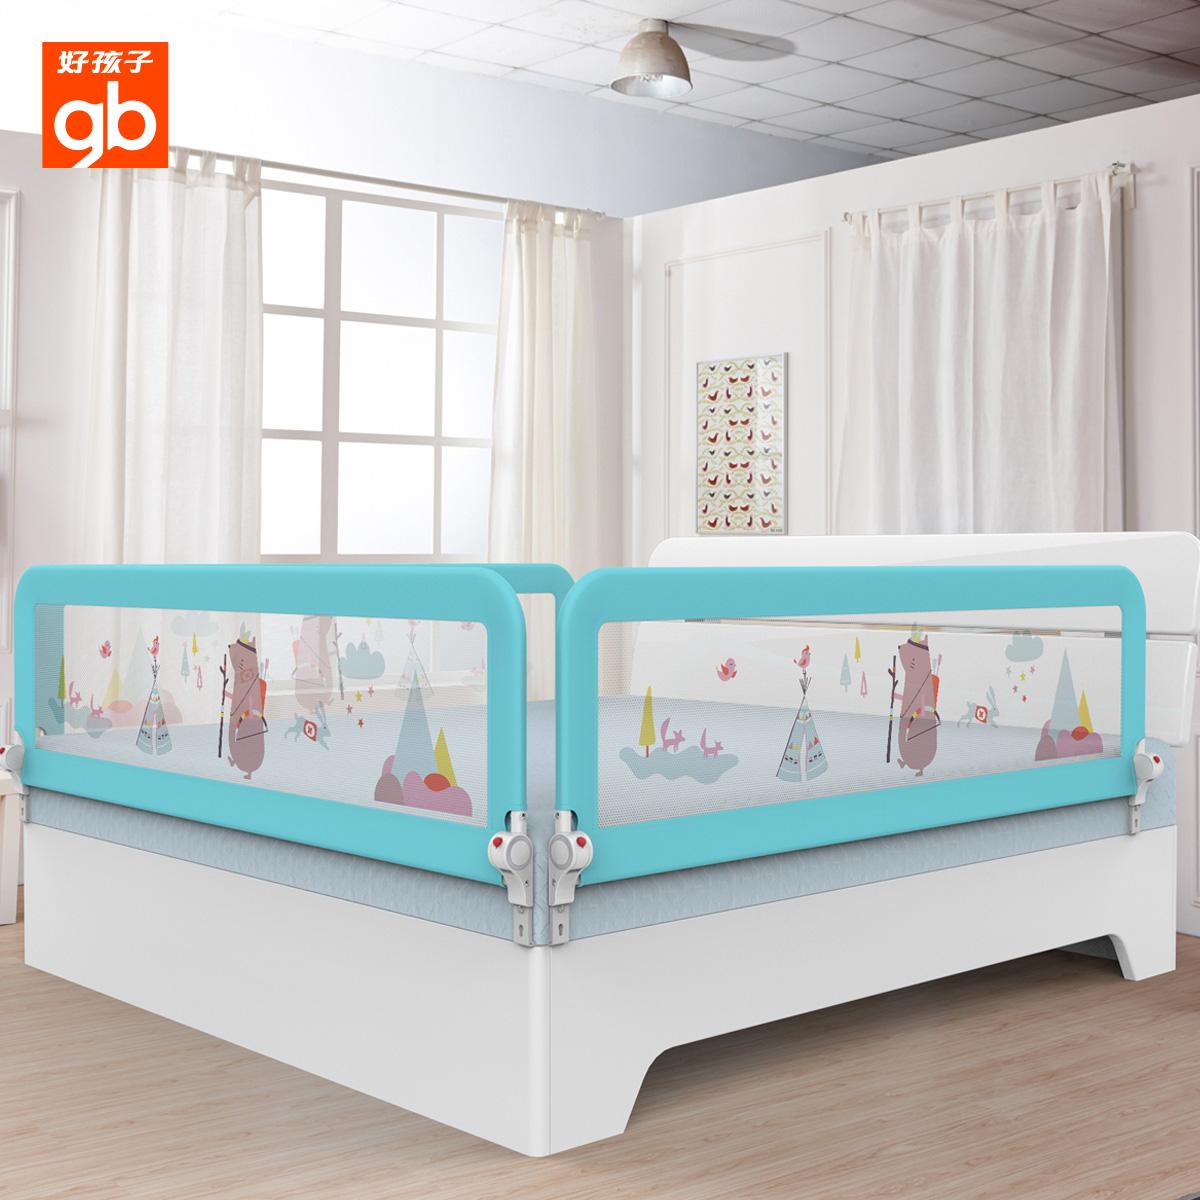 gb良い子ベッド赤ちゃんガードレール児童ベビーベッドベッドフェンスにベッド用品船首止め金CW200